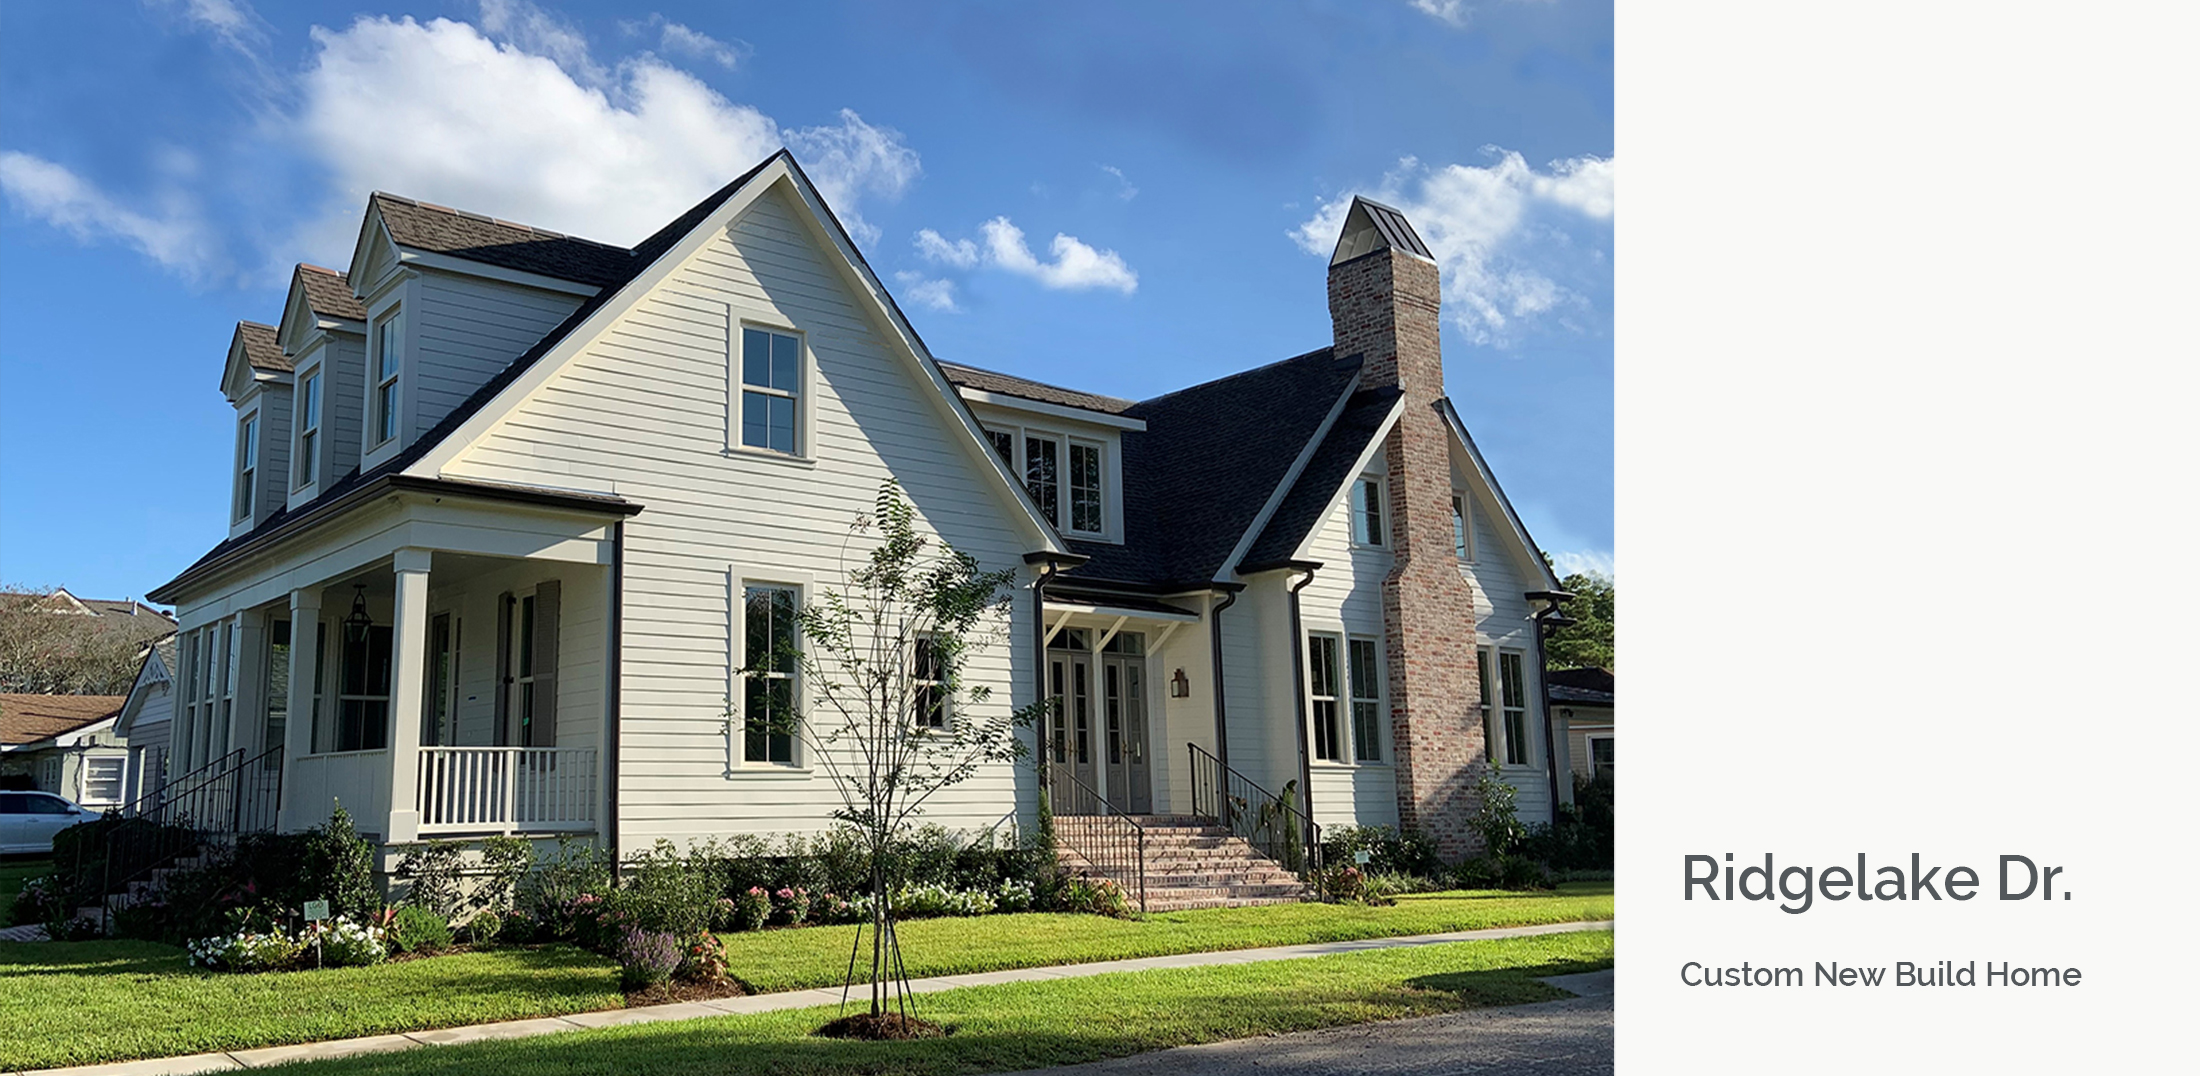 Ridgelake Drive House - Woolf Architecture